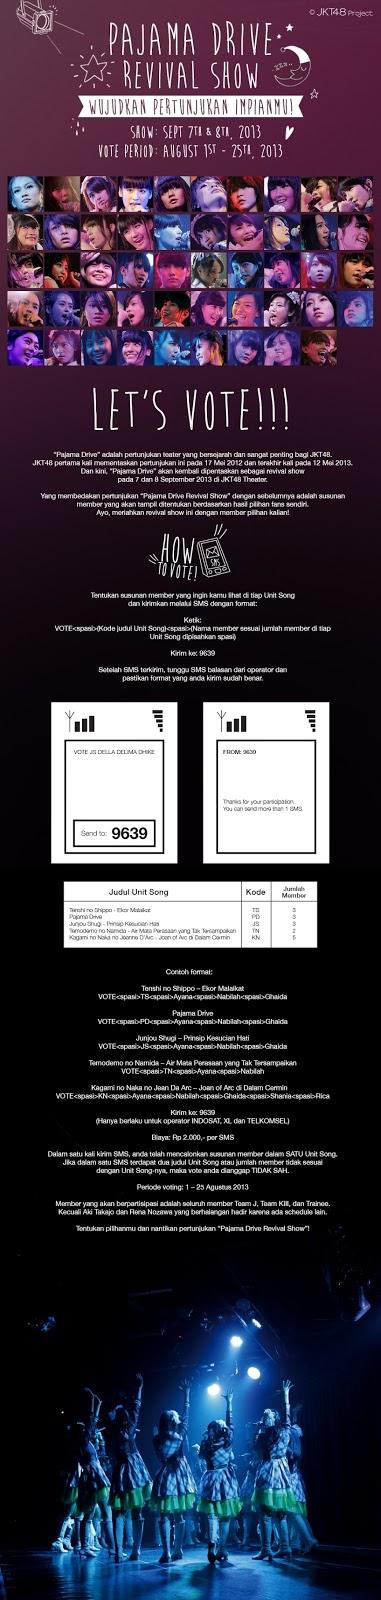 Cara Vote JKT48 Pajama Drive Revival Show